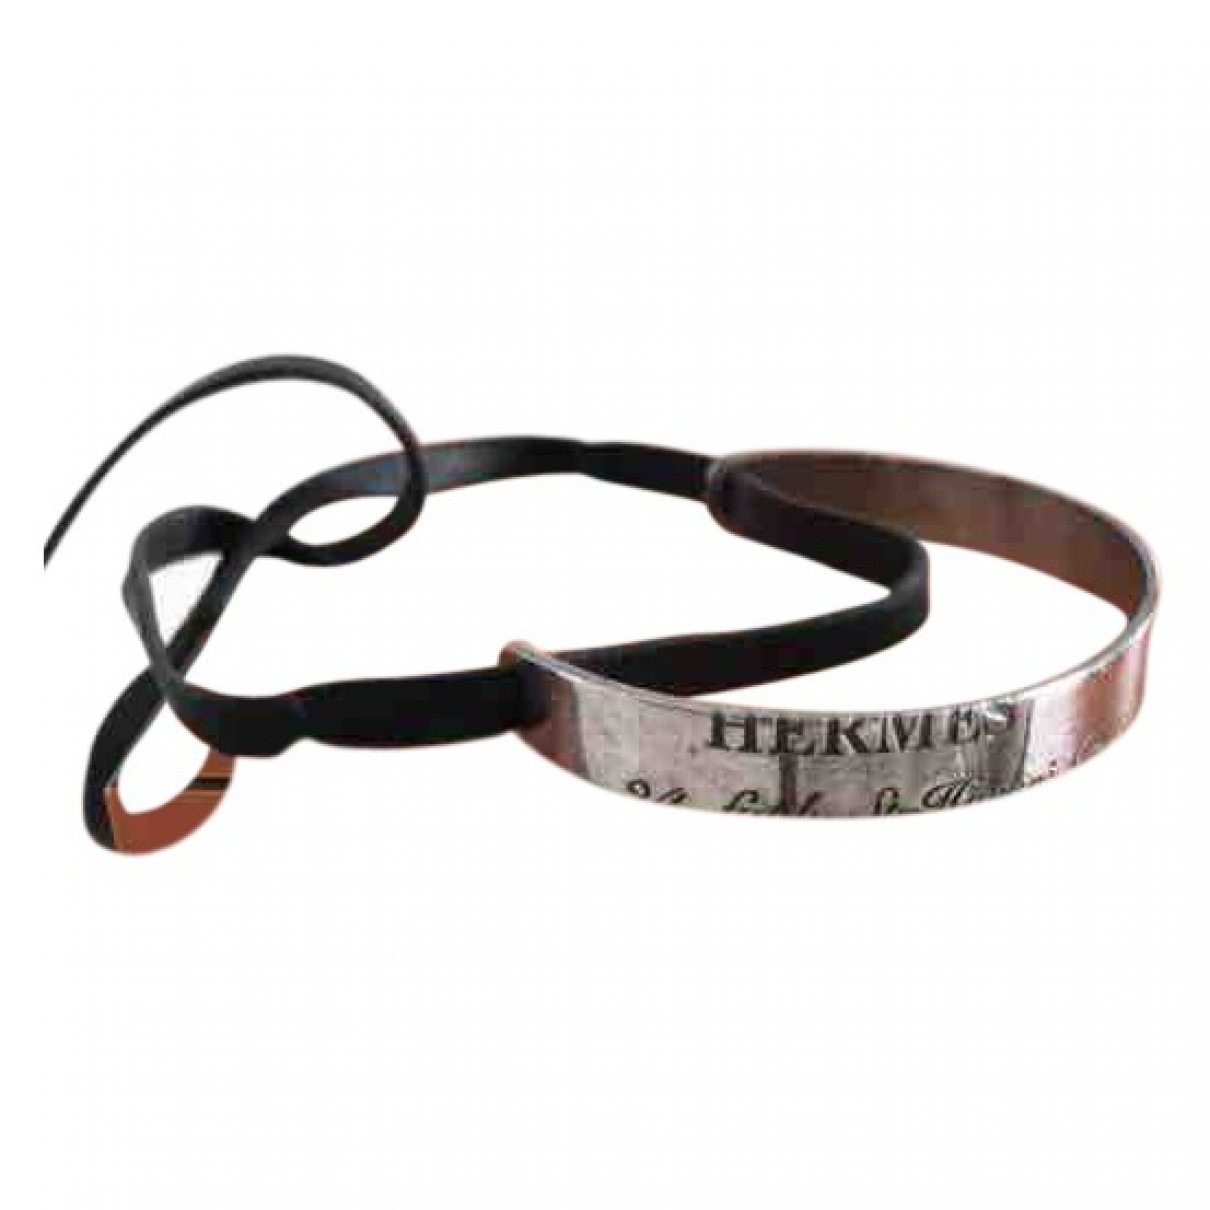 Hermes Bracelet Charniere Armband in  Schwarz Leder